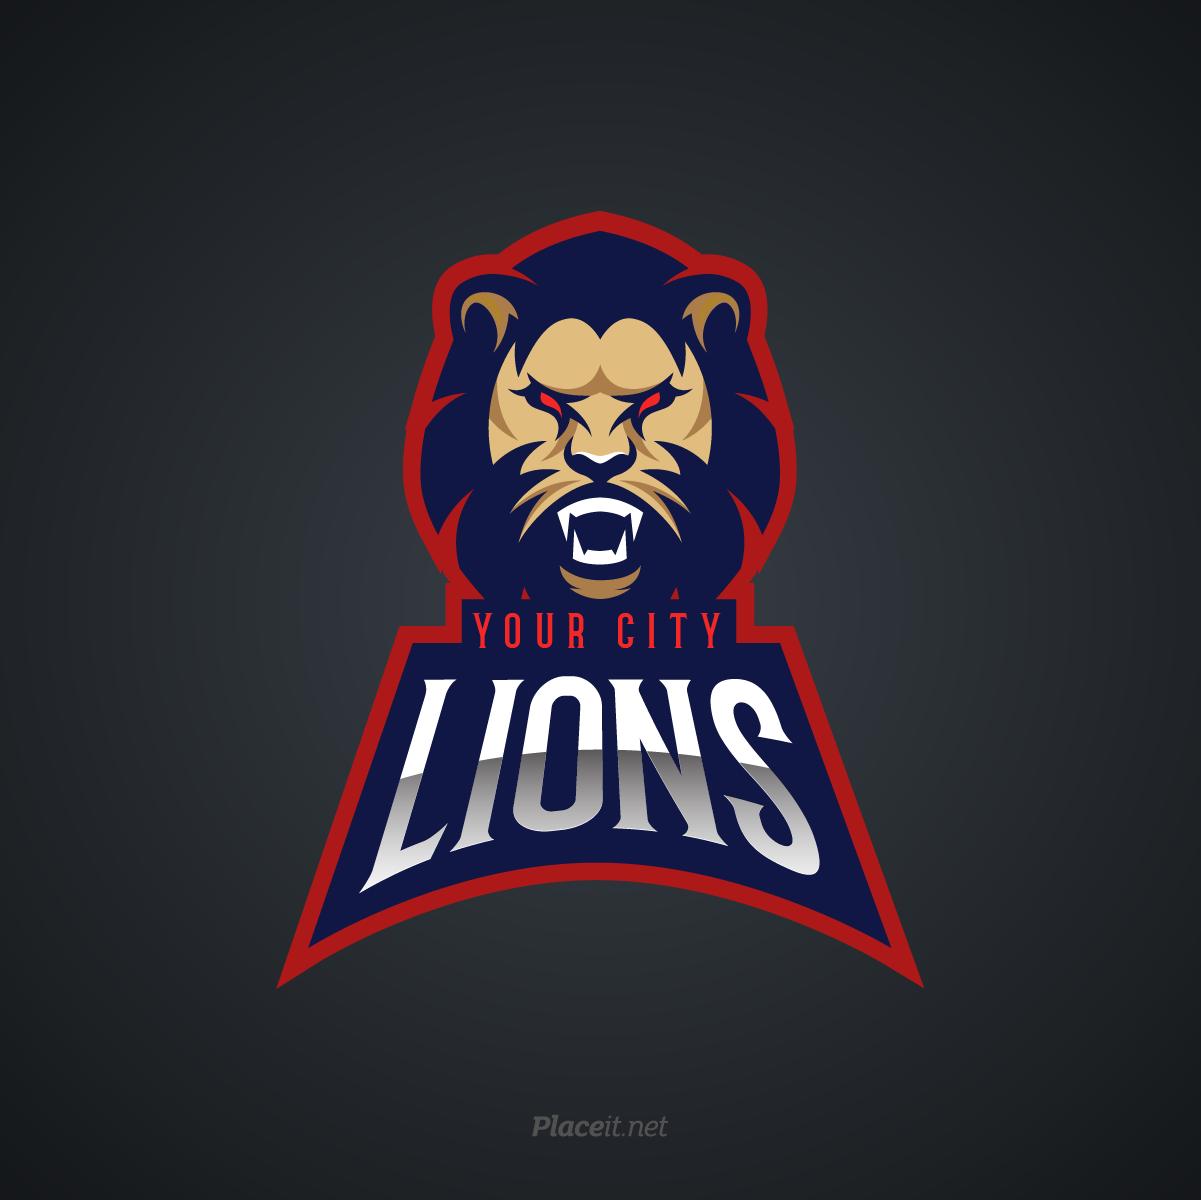 Lions sports logo